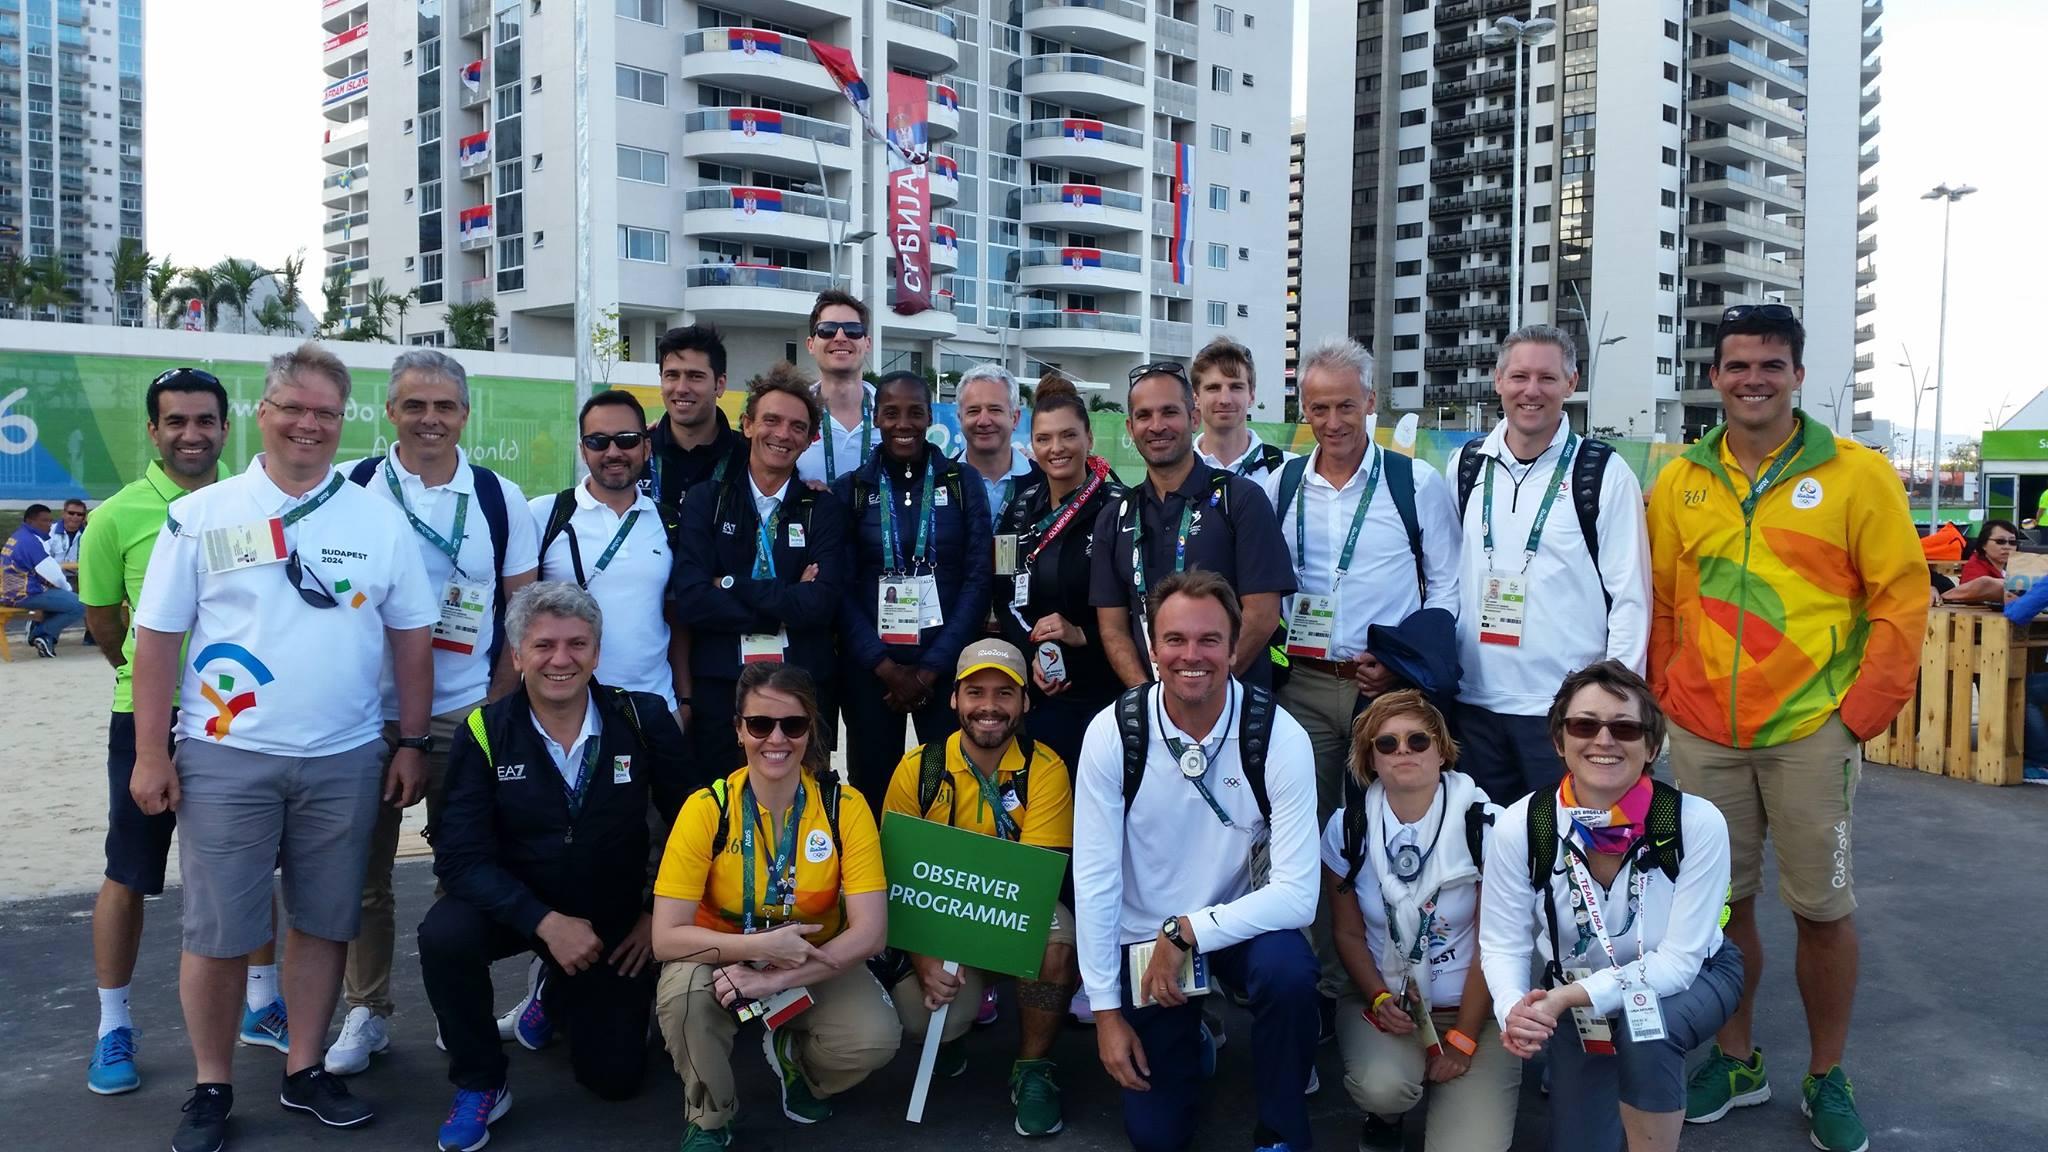 LA 2024 Olympic and Paralympic Bid Process - Rio Observer program